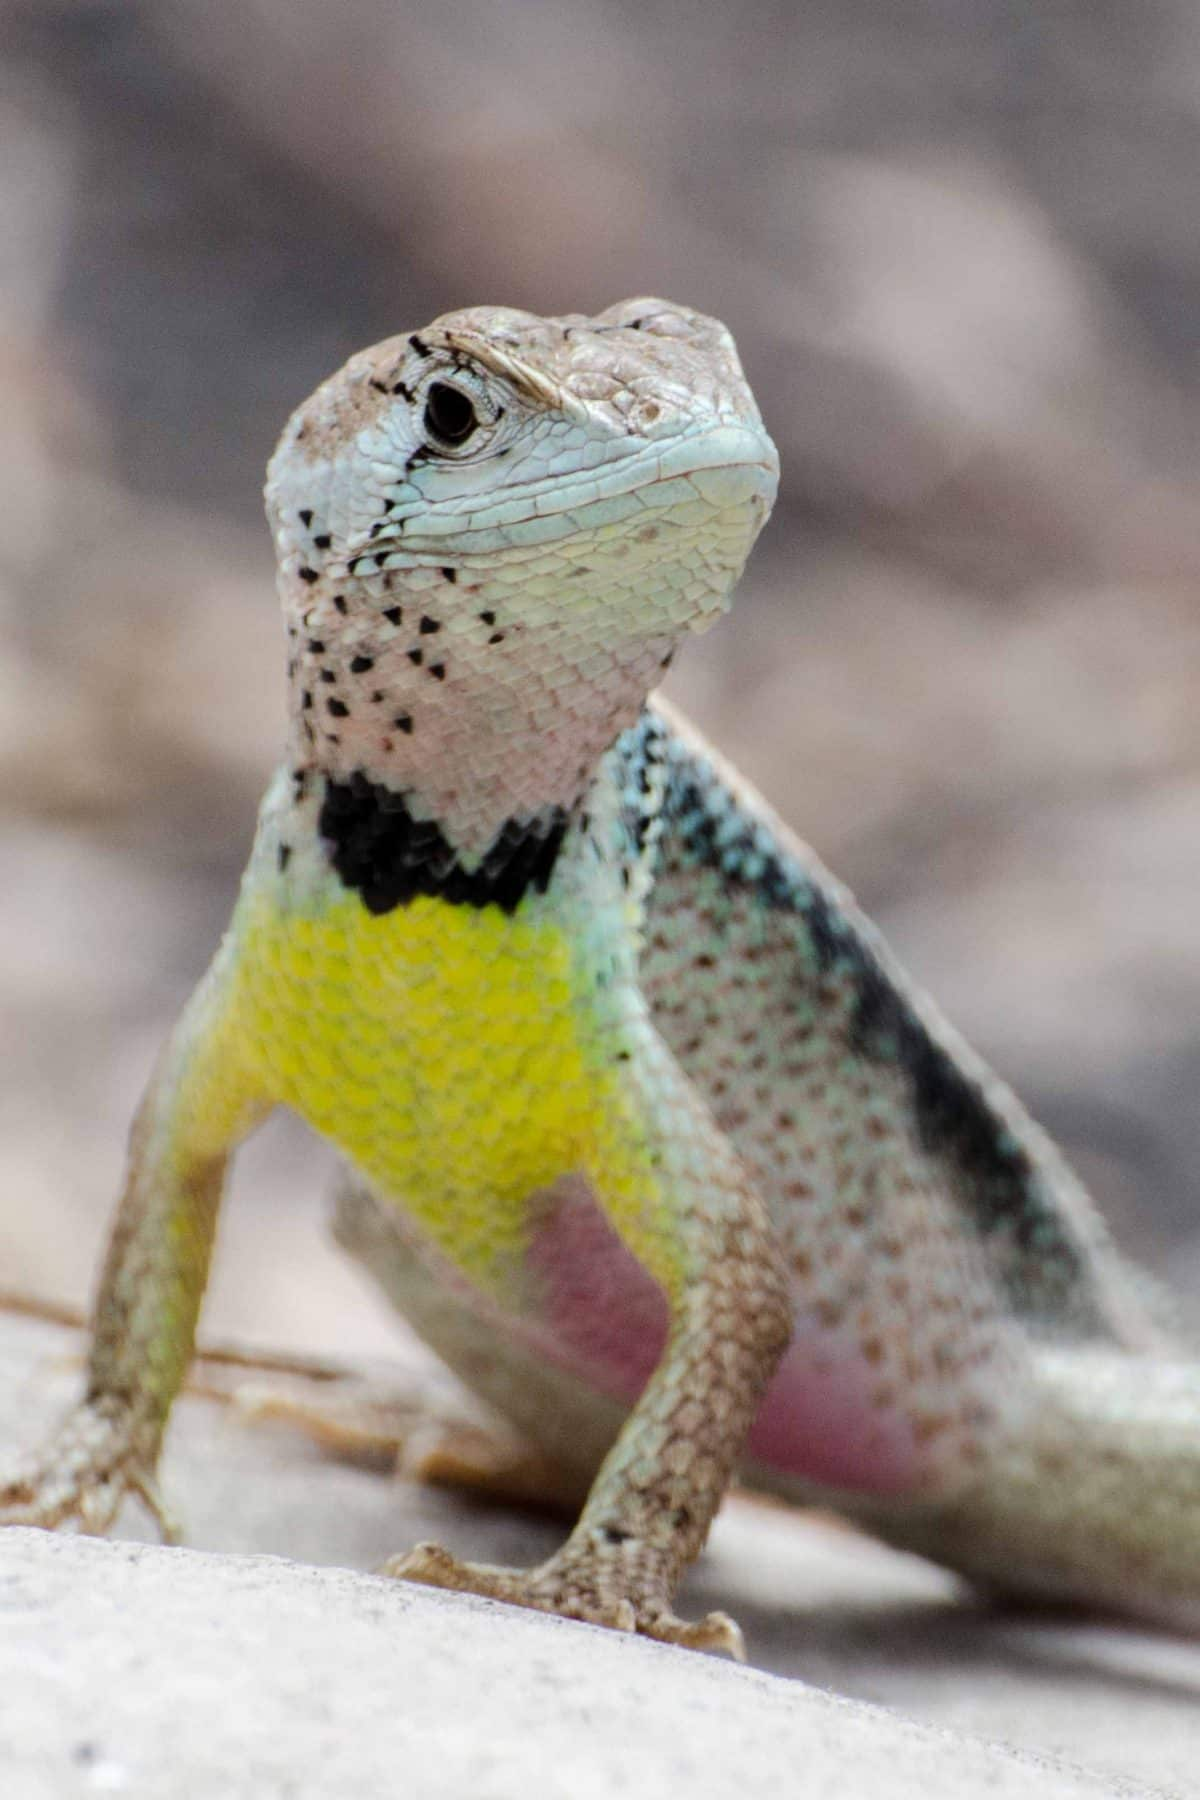 A Colorful Lizard, Bosque, Cerro Blanco, Guayaquil, Ecuador | © Angie Drake / Ecuador Por Mis Ojos